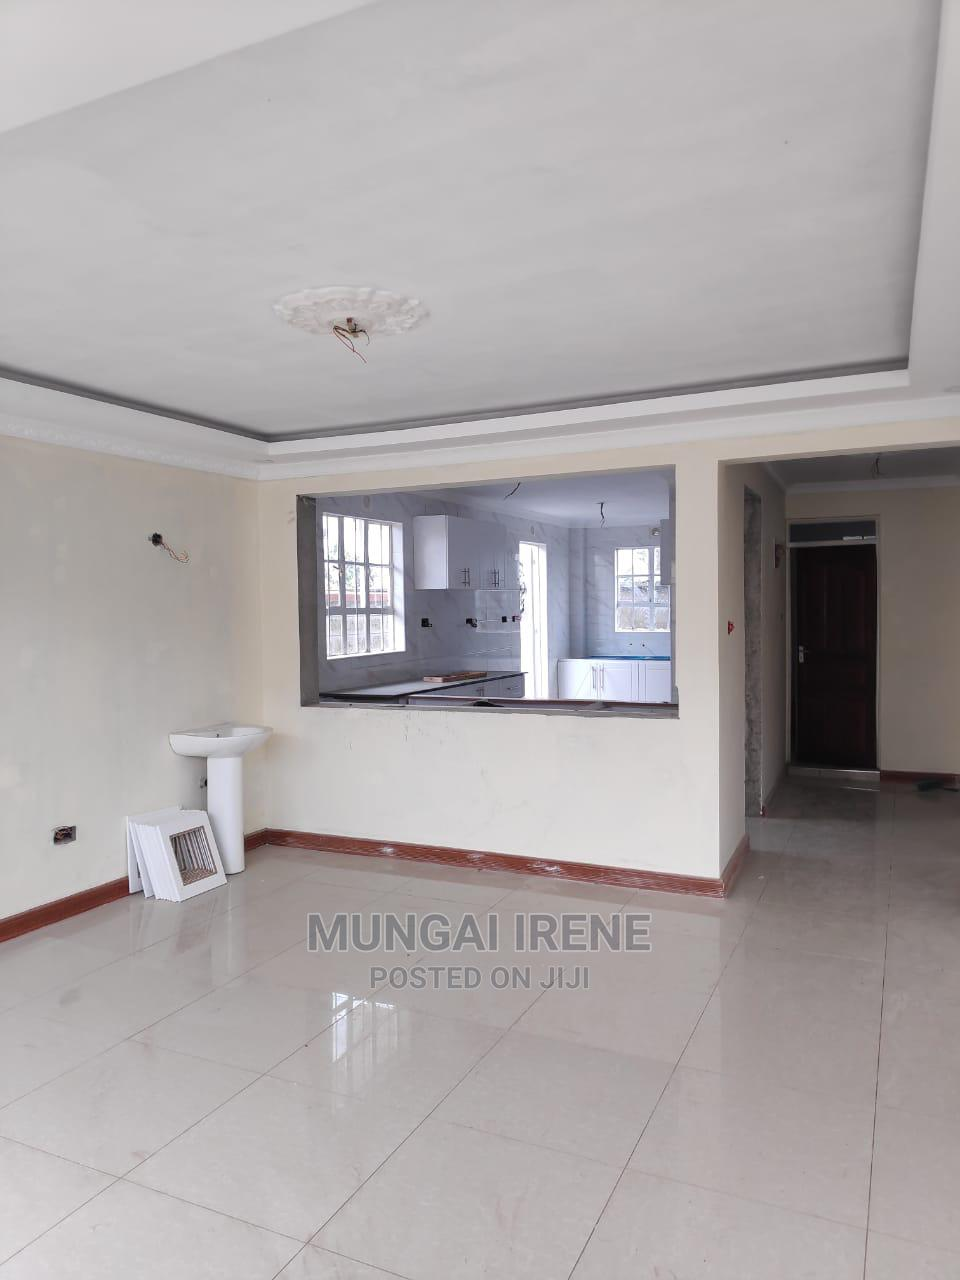 4bdrm Maisonette in Laki Gardens, Ruiru for Sale | Houses & Apartments For Sale for sale in Ruiru, Kiambu, Kenya